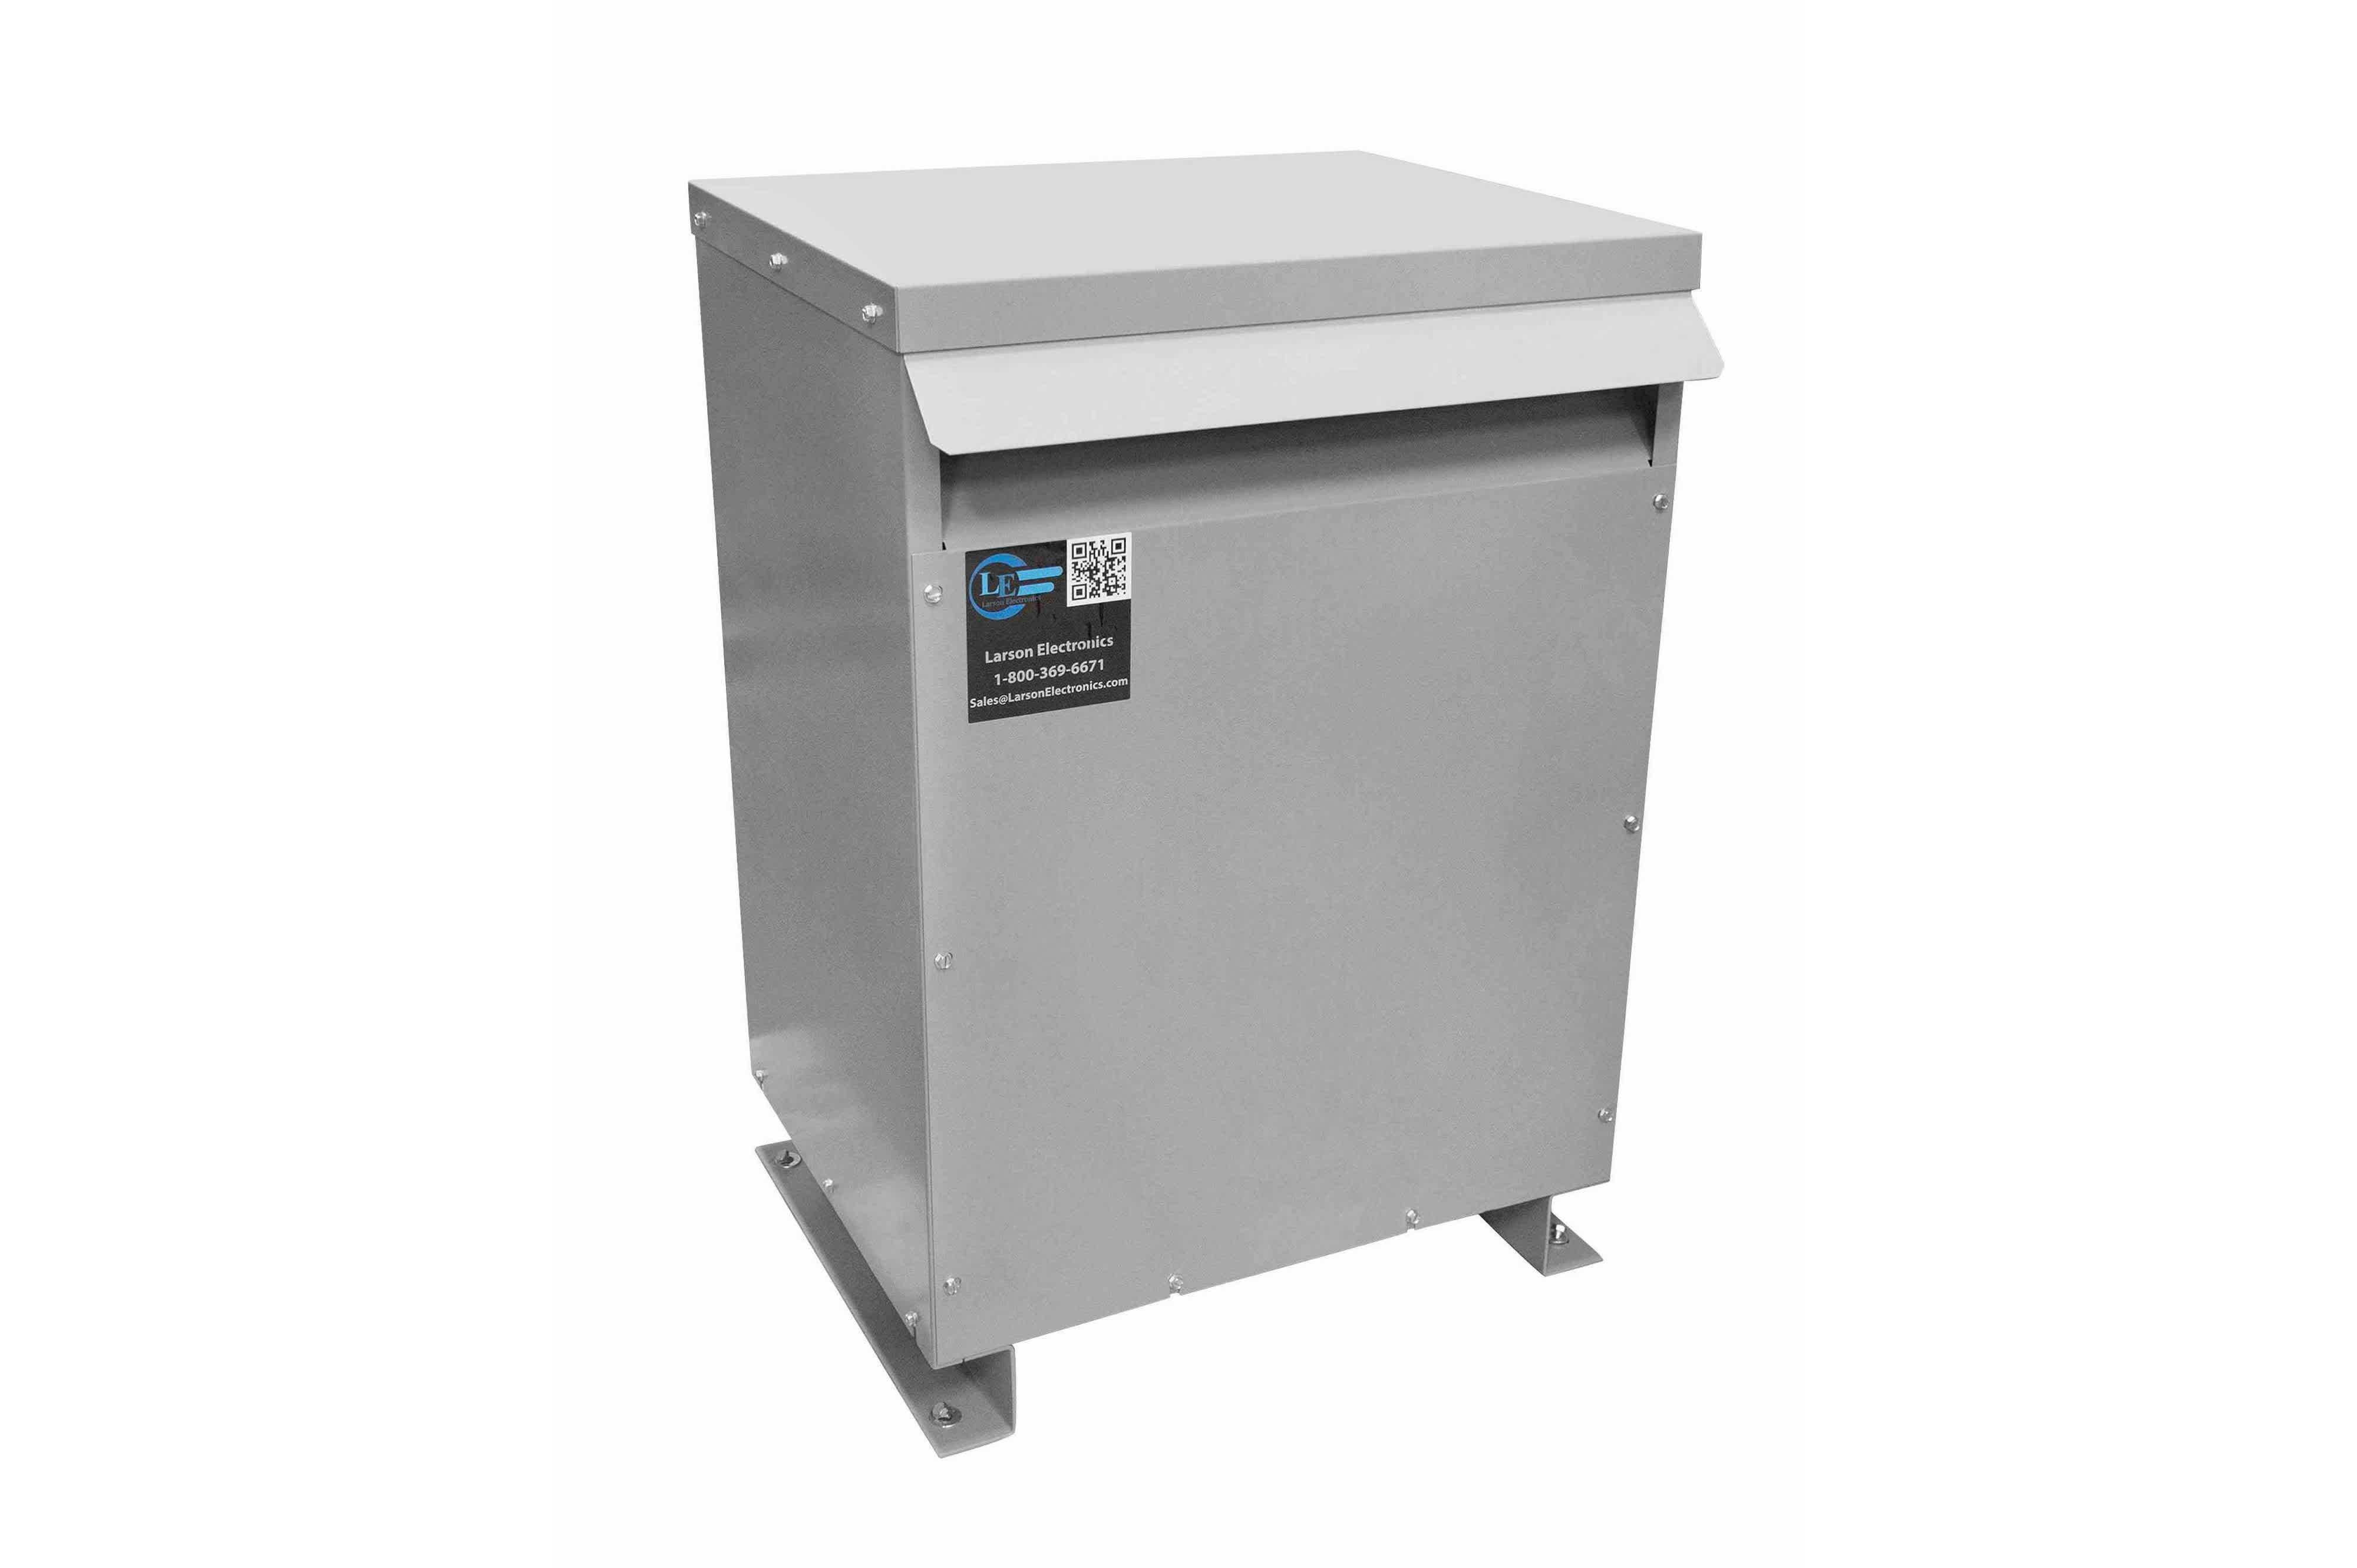 60 kVA 3PH Isolation Transformer, 220V Wye Primary, 480V Delta Secondary, N3R, Ventilated, 60 Hz